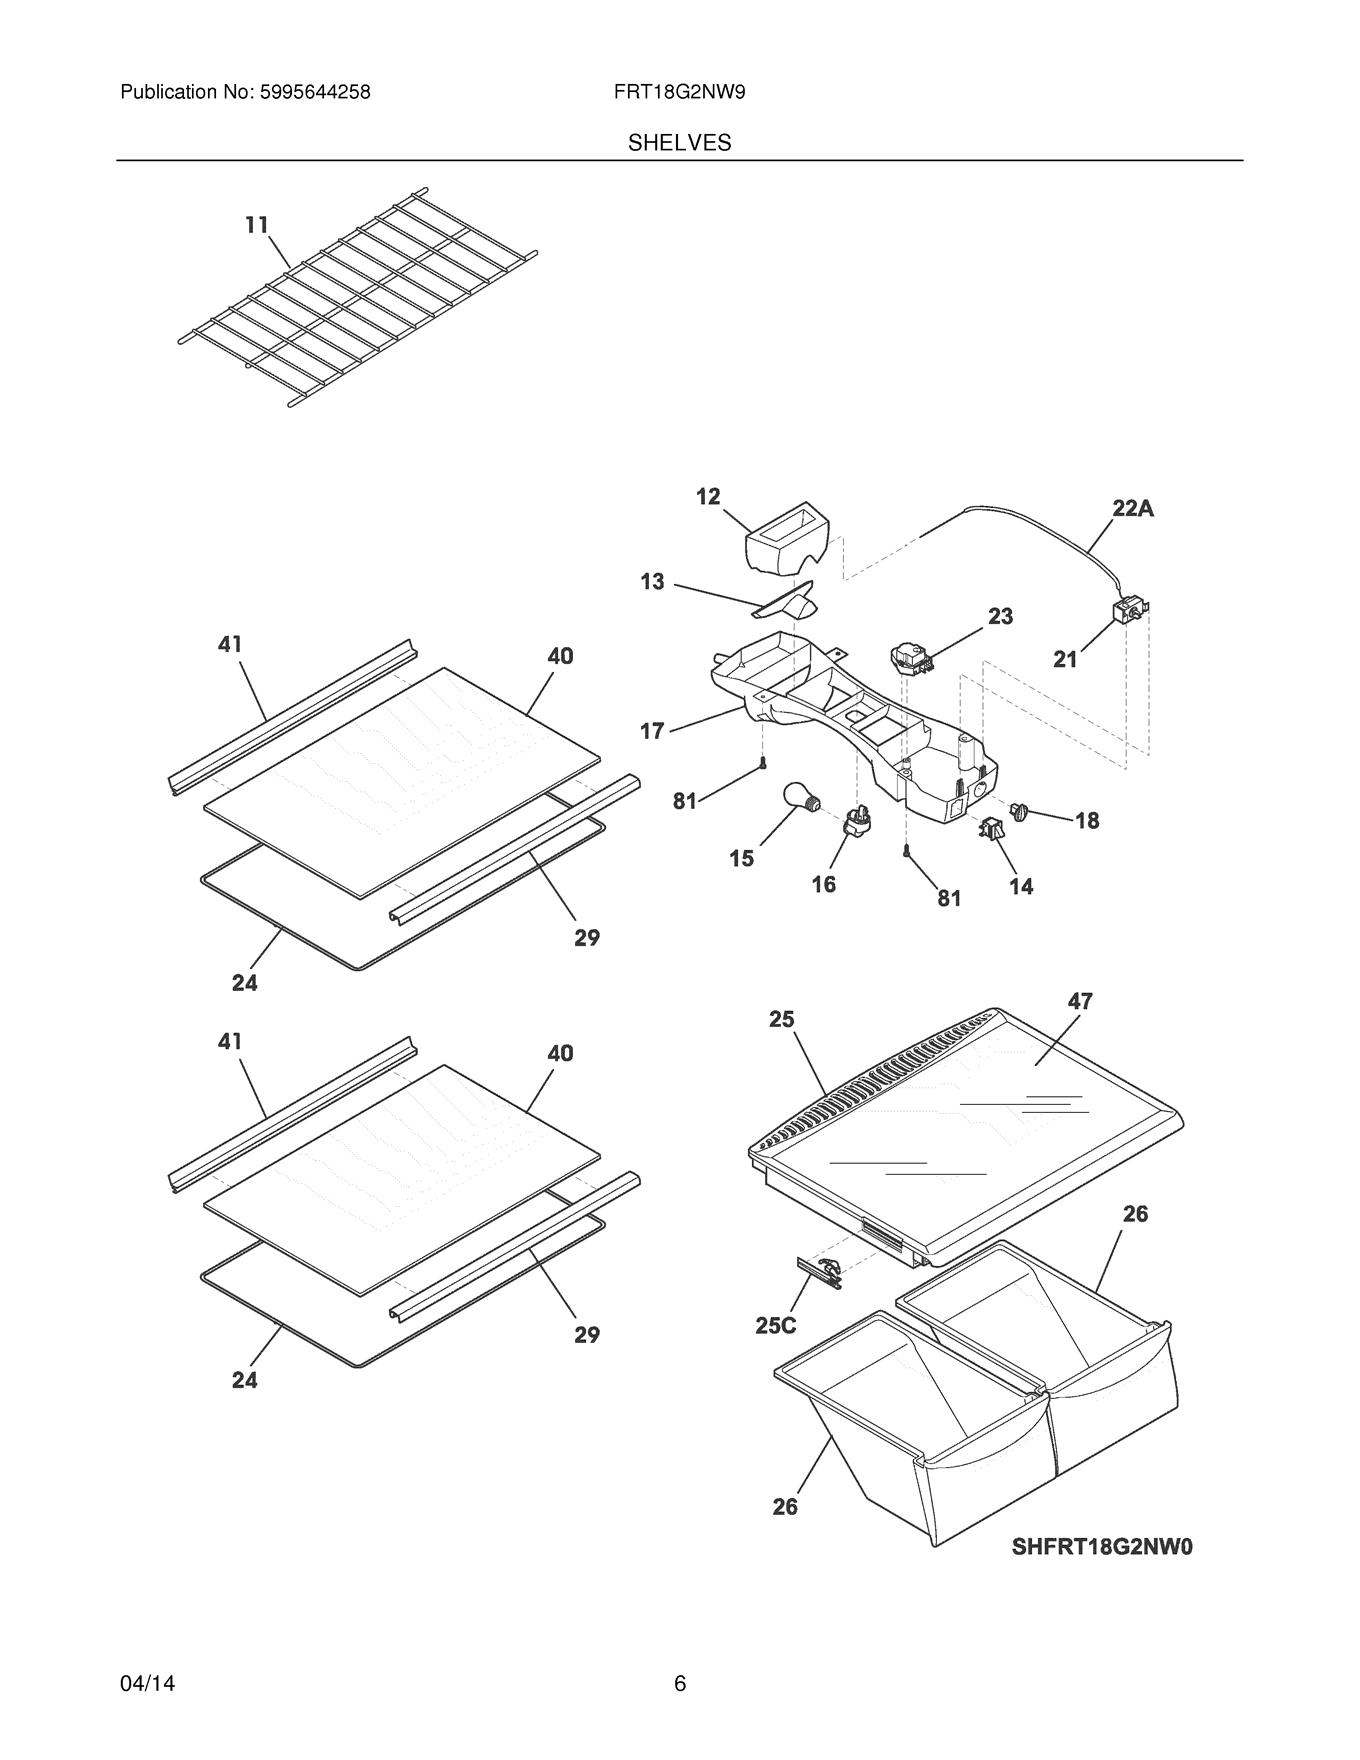 Frigidaire Frt18g2nw9 Control Box Wiring Harness Genuine Oem